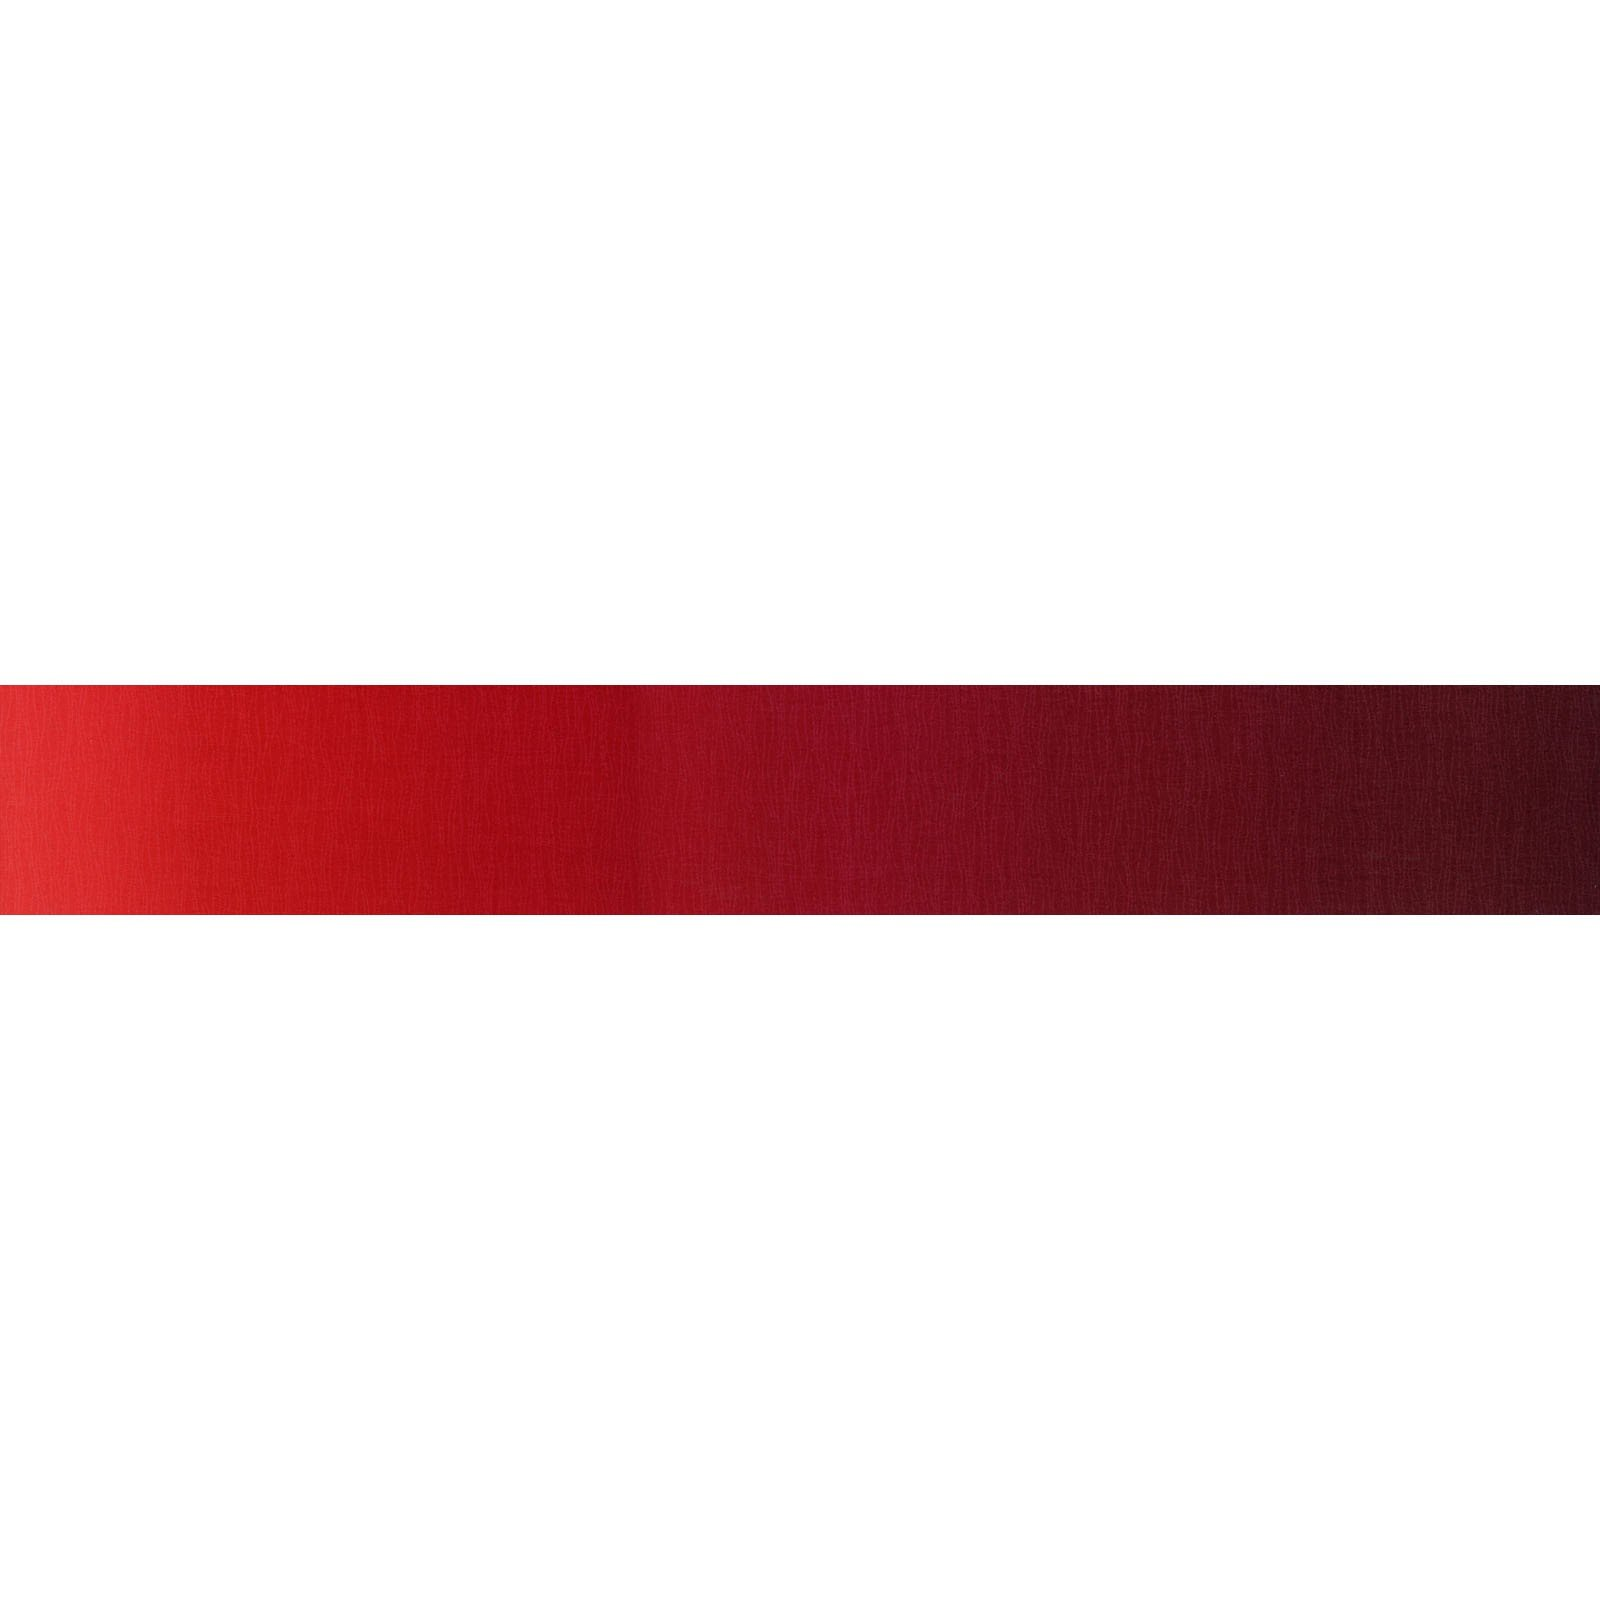 Gelato Ombre Red